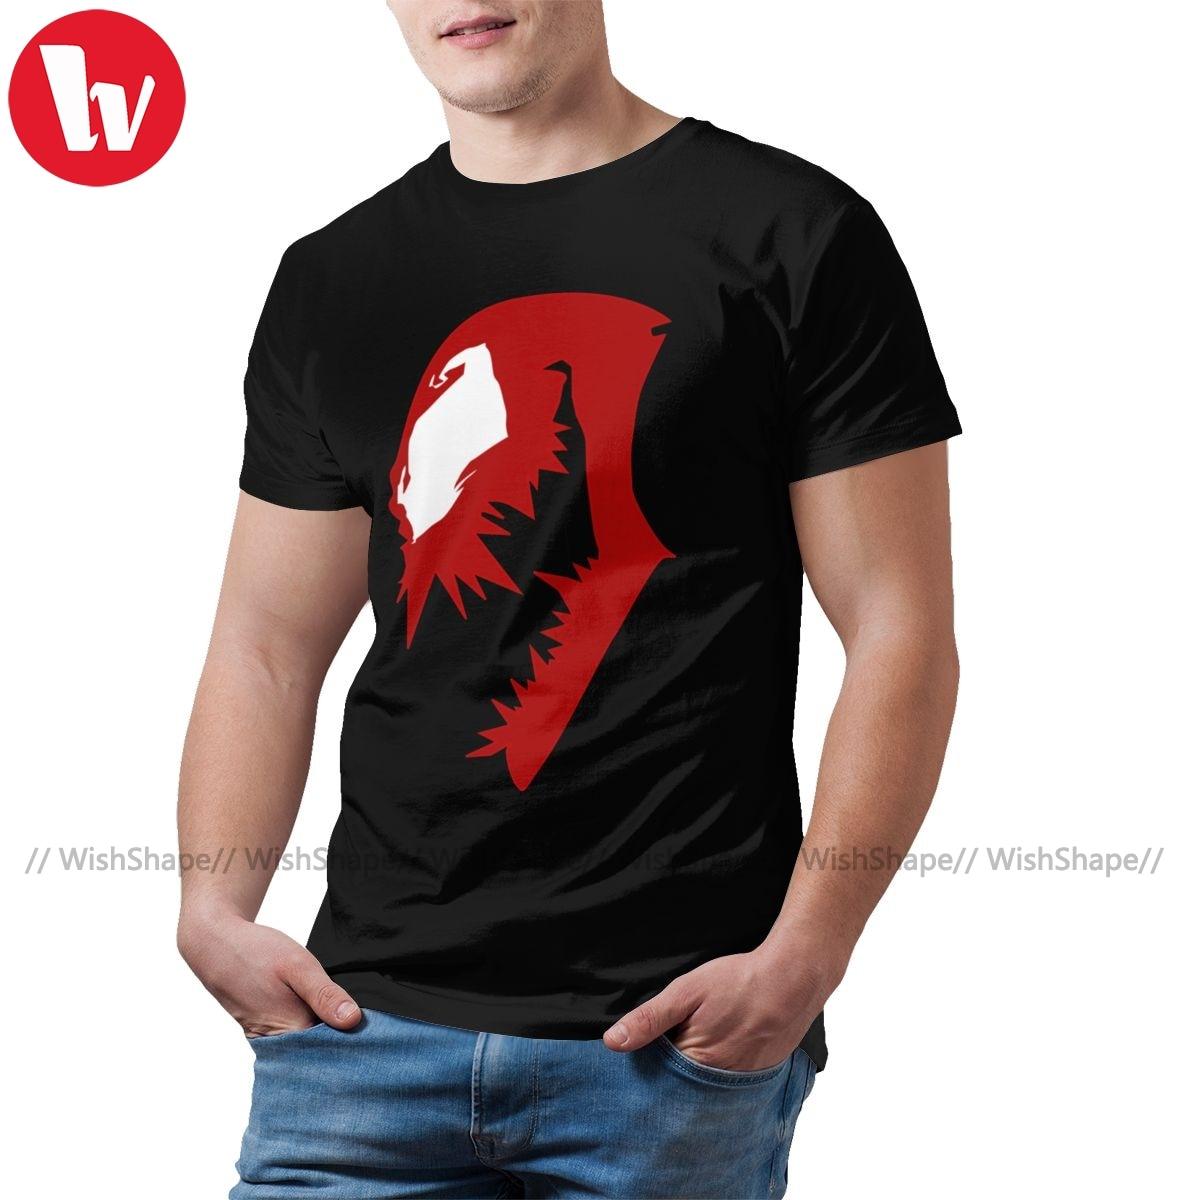 Camiseta de toxina con estampado de Carnage, camiseta de manga corta para hombre, ropa de calle divertida, 100 de algodón, camiseta 5xl